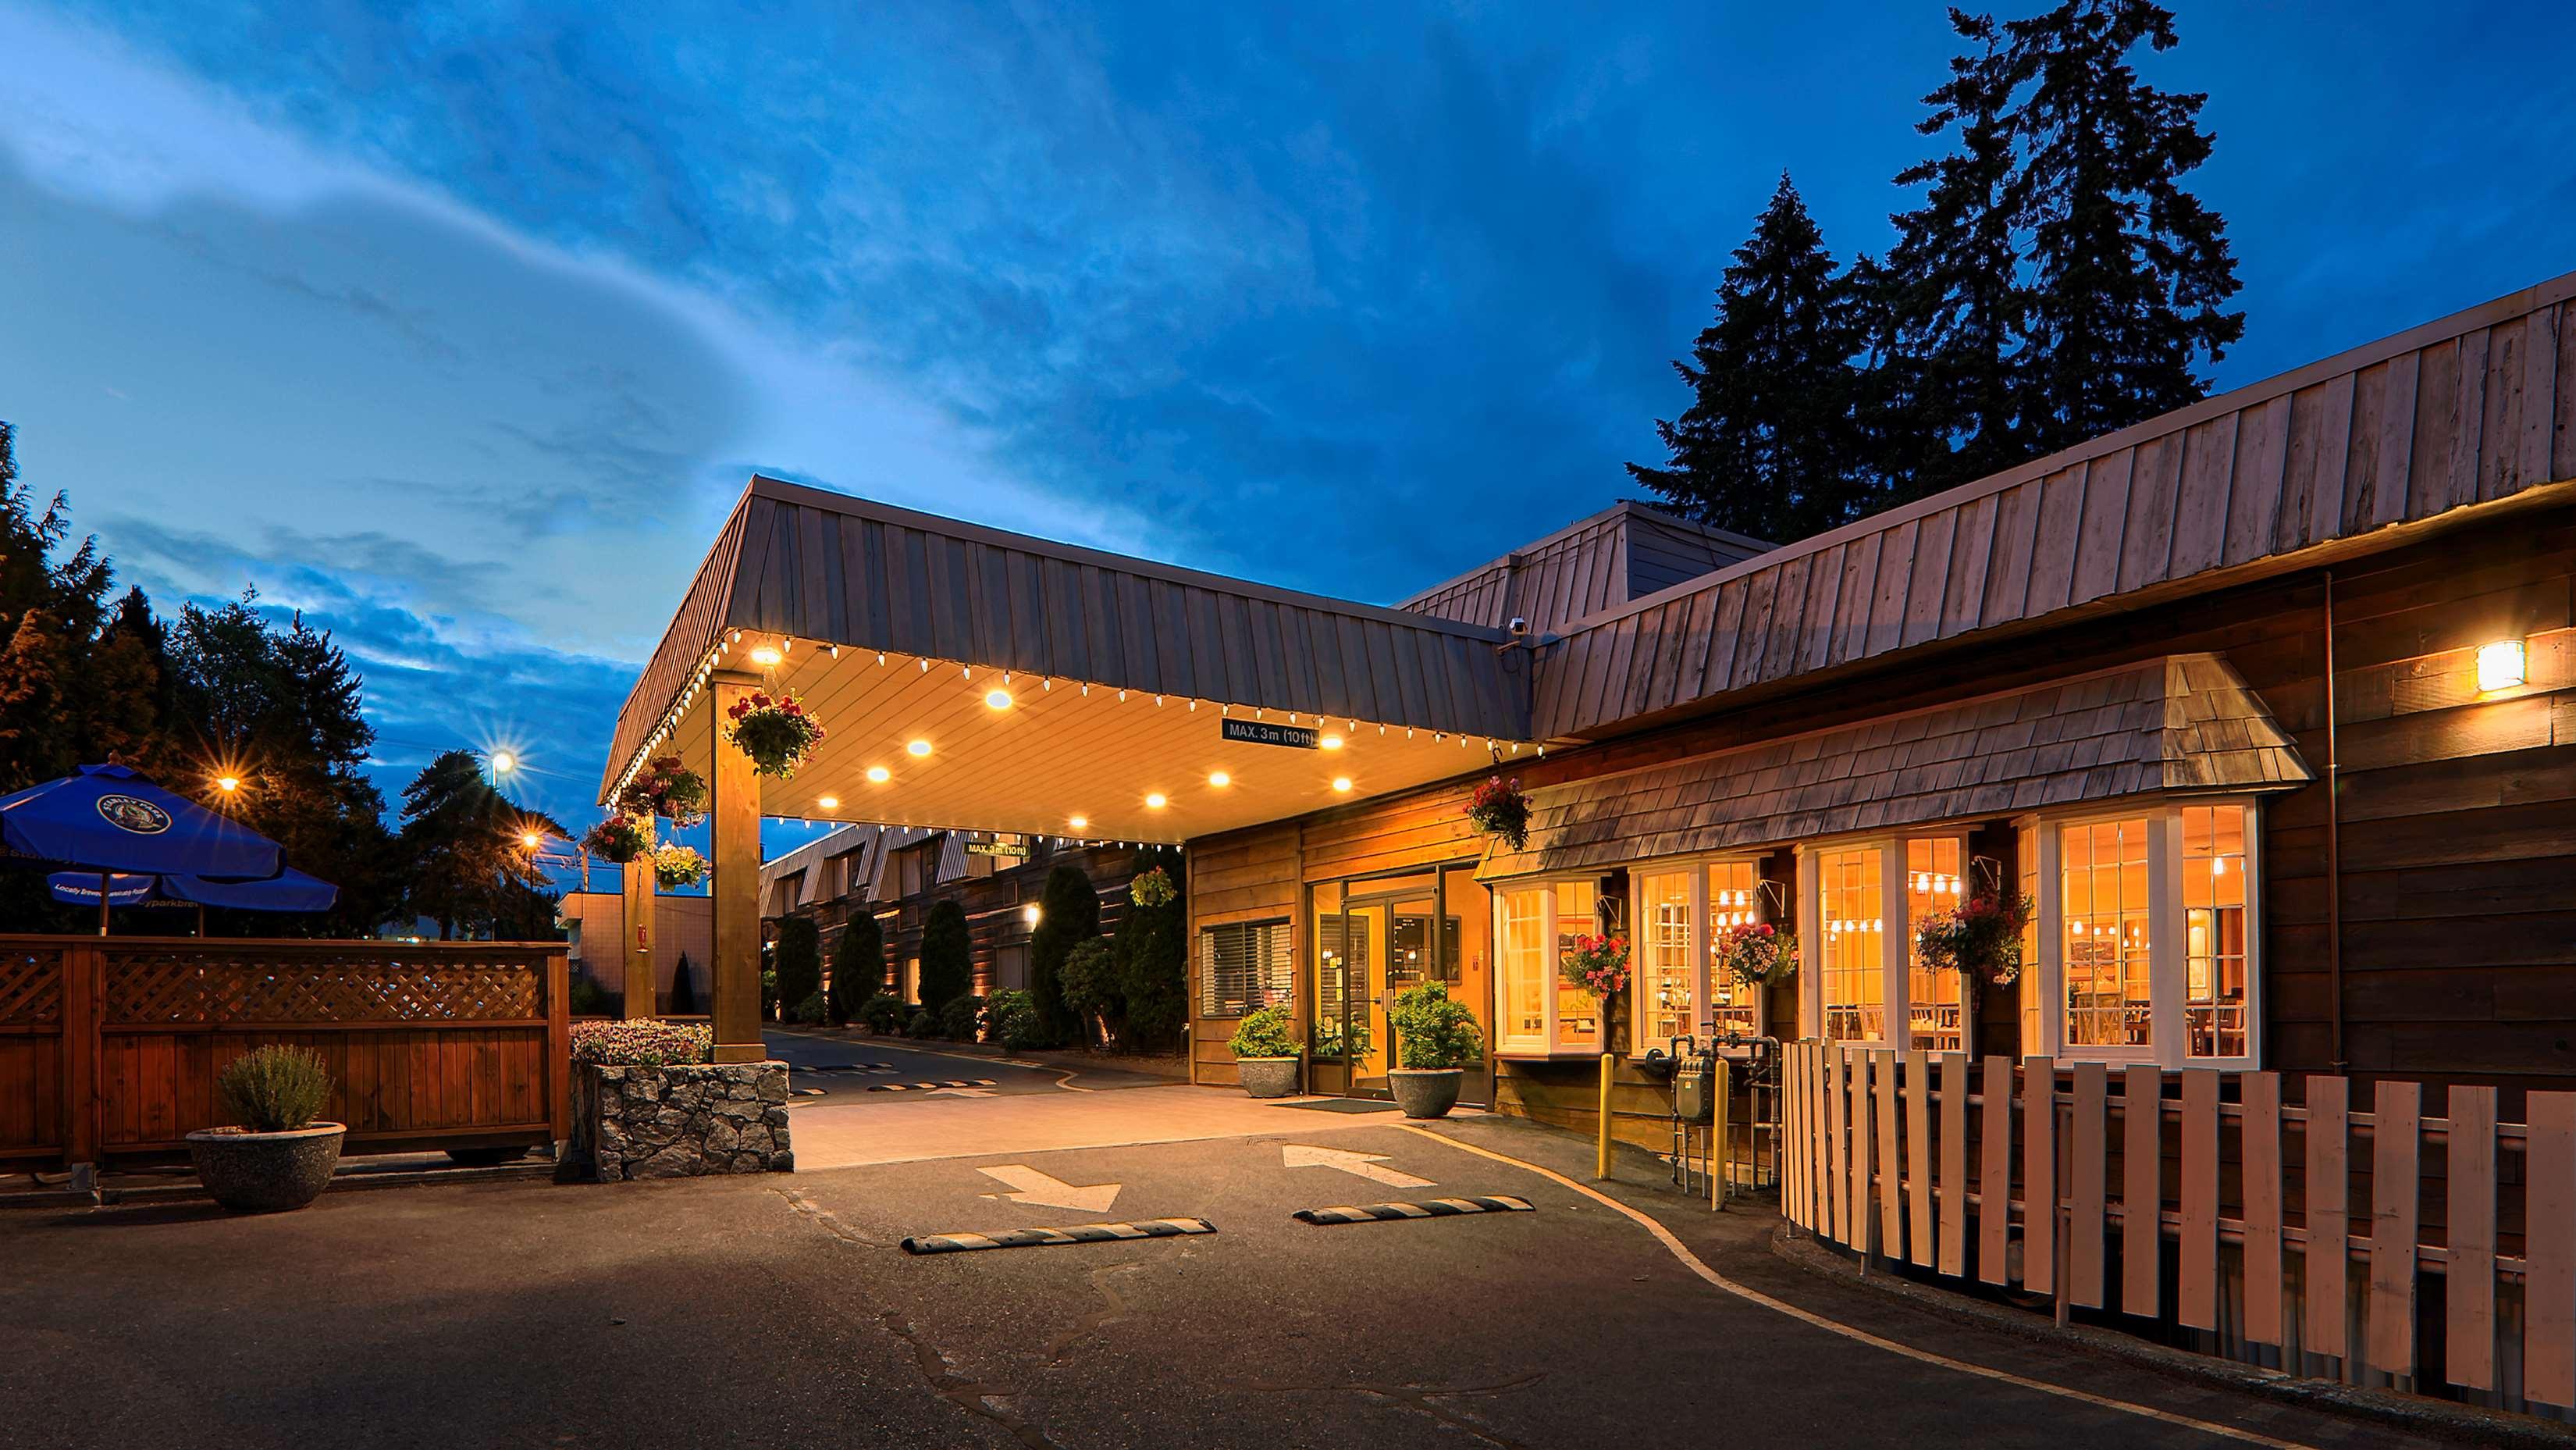 Best Western Cowichan Valley Inn in Duncan: Exterior